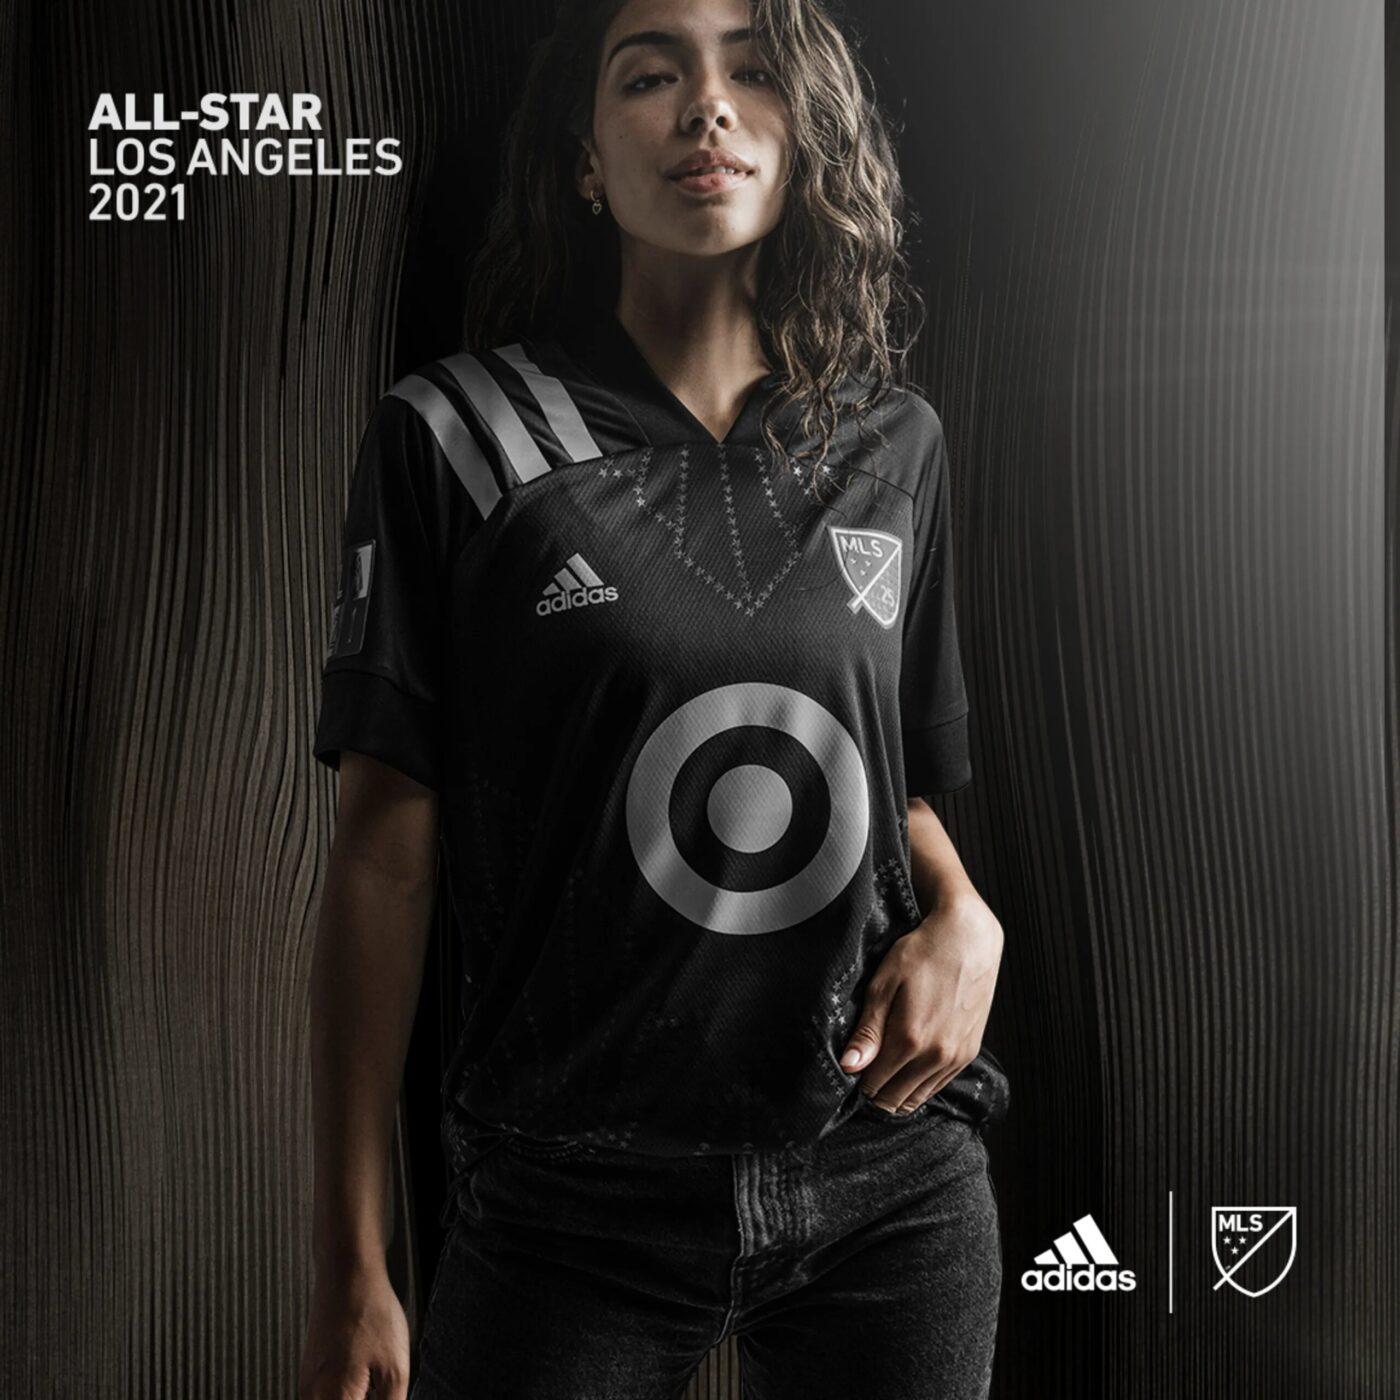 Maillot MLS All-Star 2021